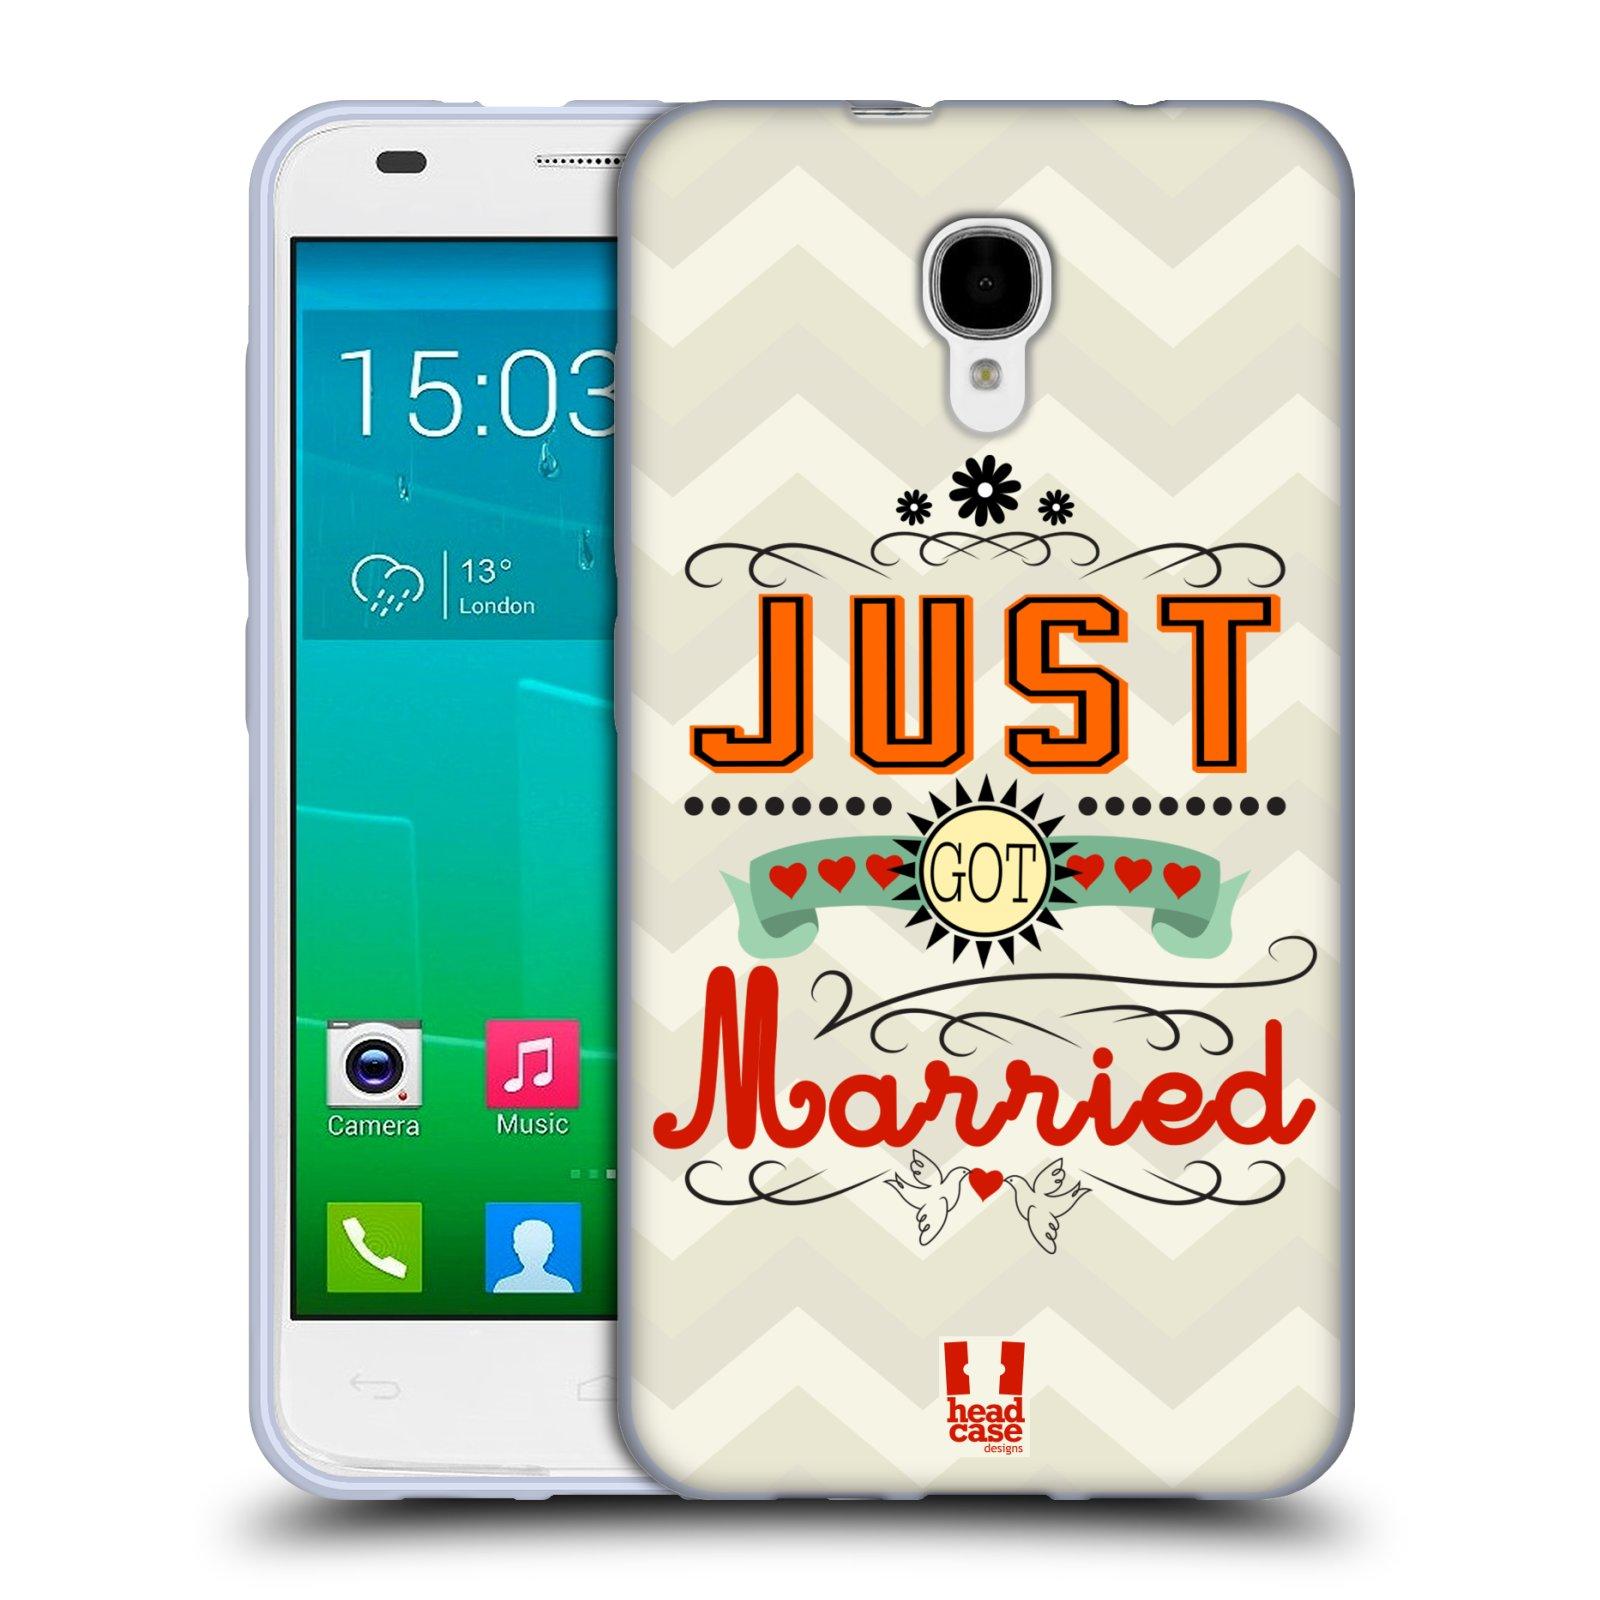 HEAD CASE DESIGNS WEDDING VOWS SOFT GEL CASE FOR ALCATEL PHONES